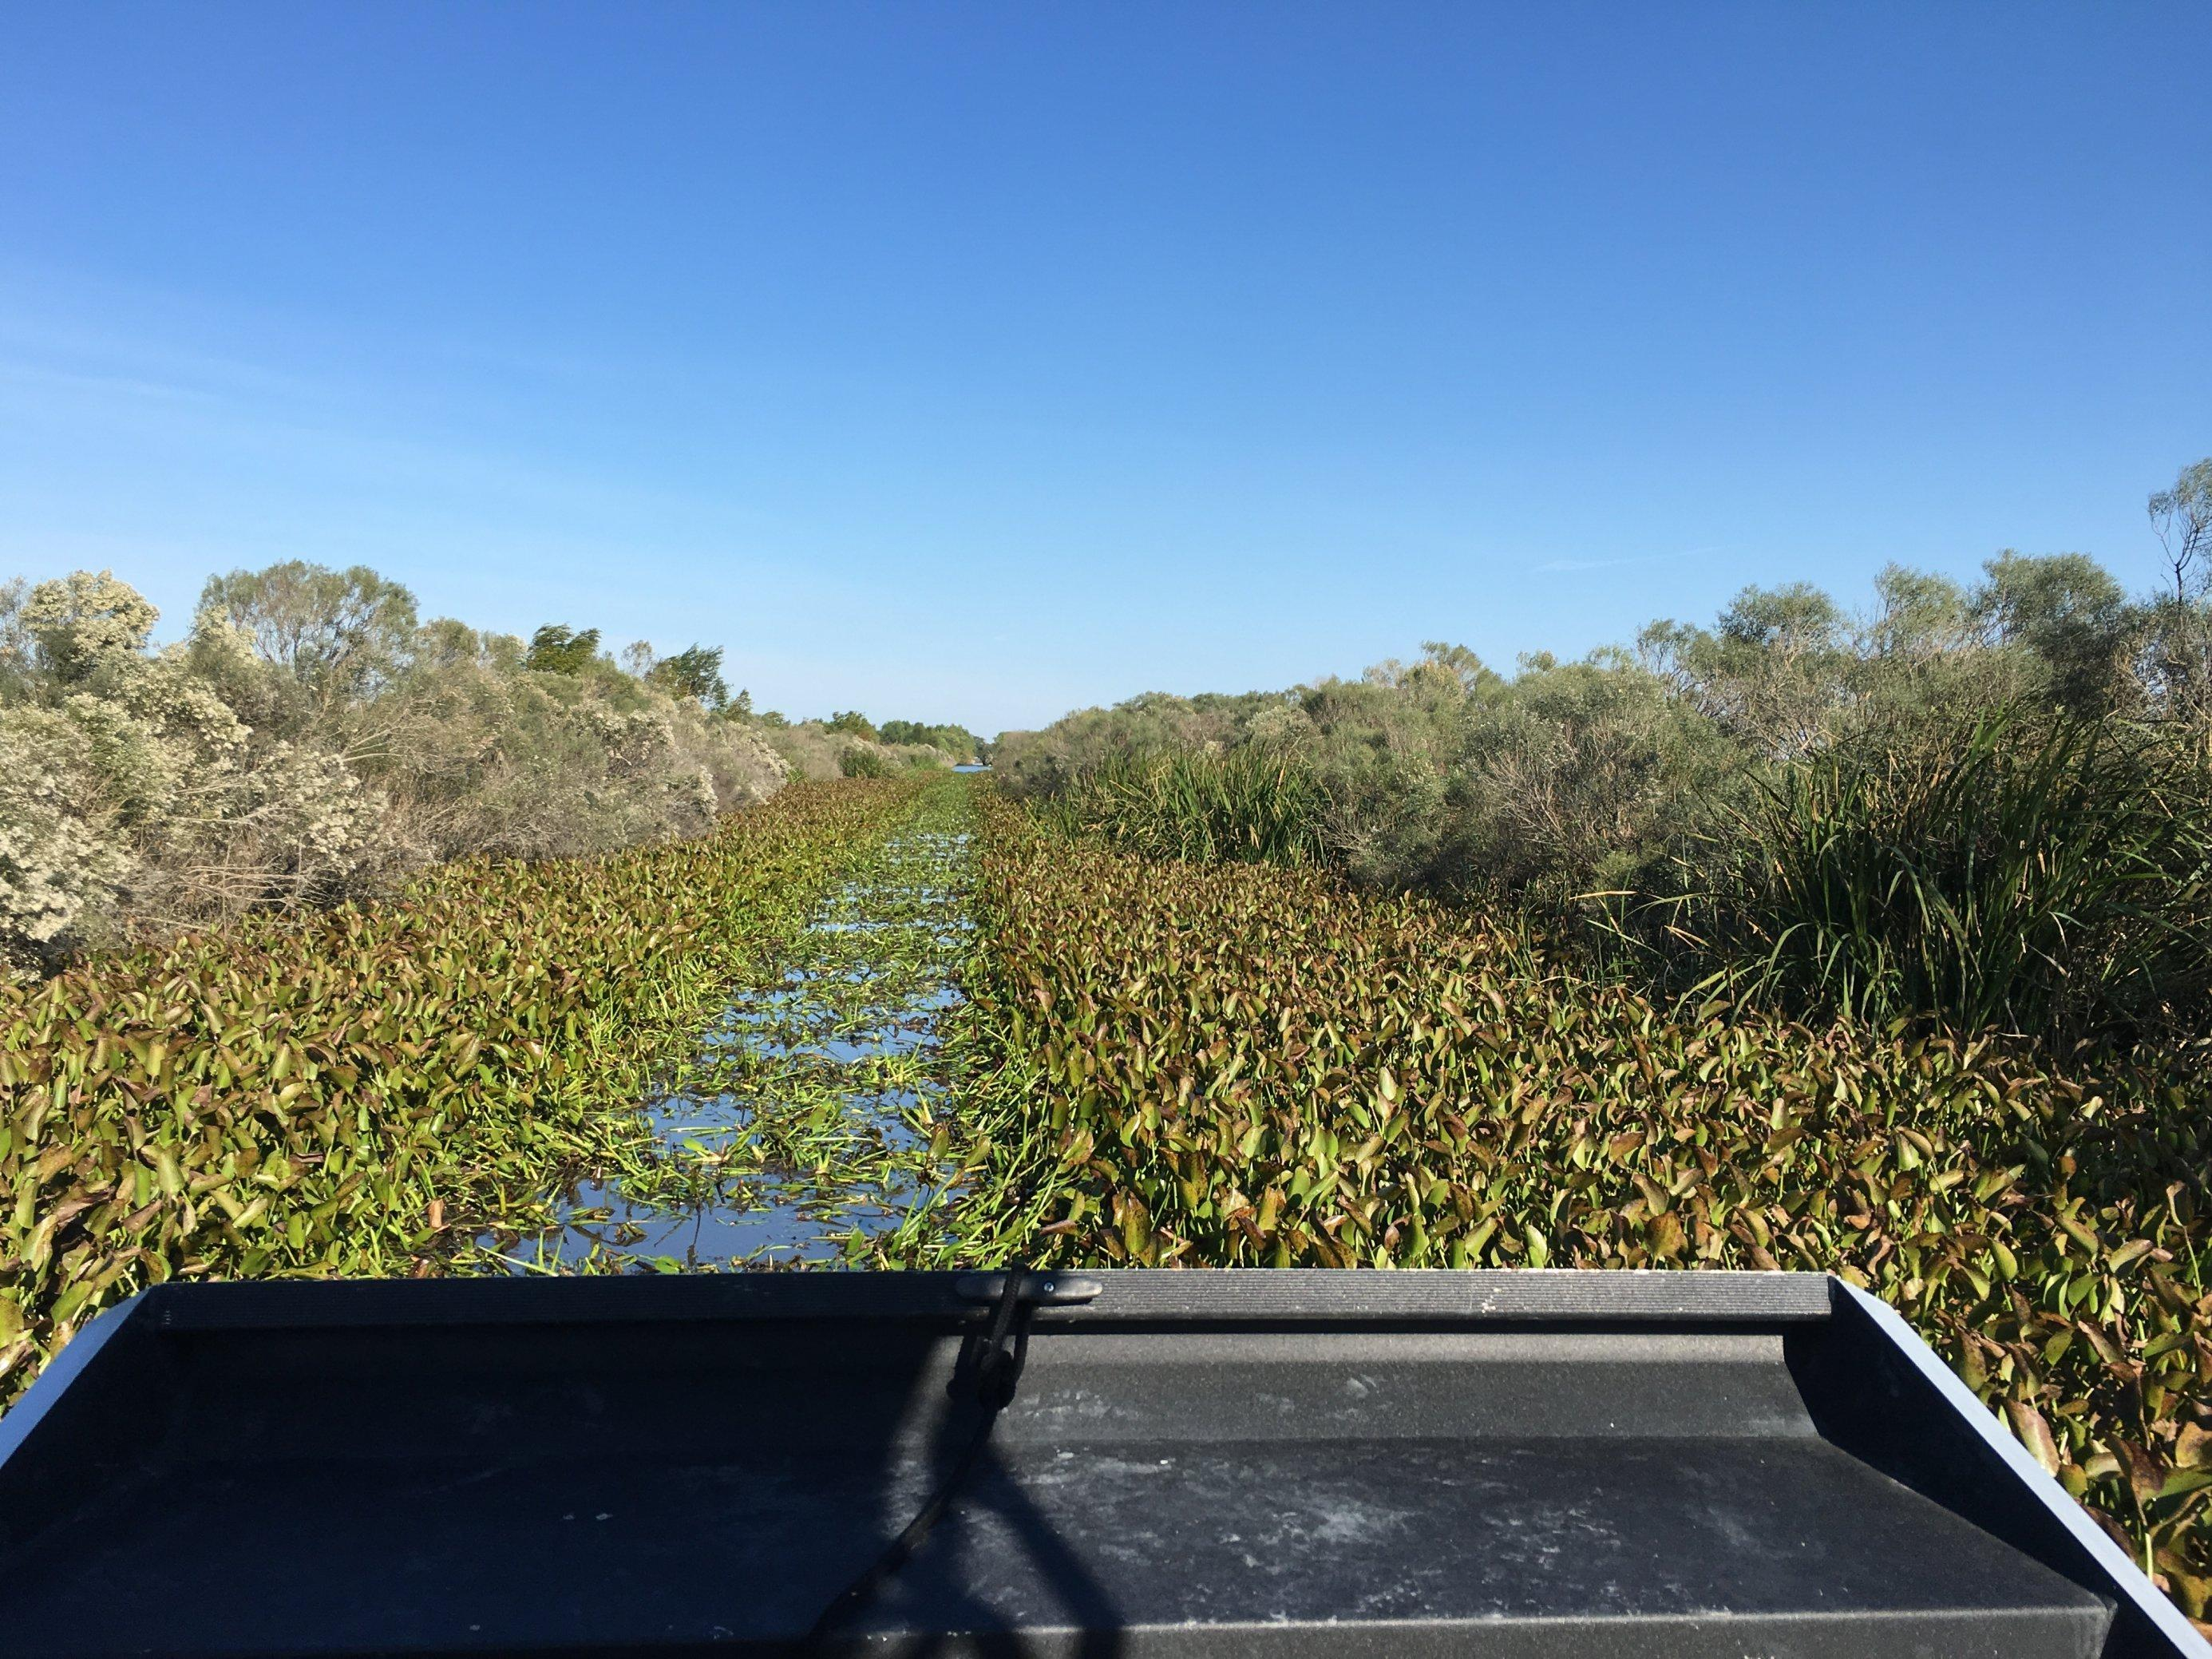 Auf in den Sumpf – per rasantem und lautem Düsen-Boot